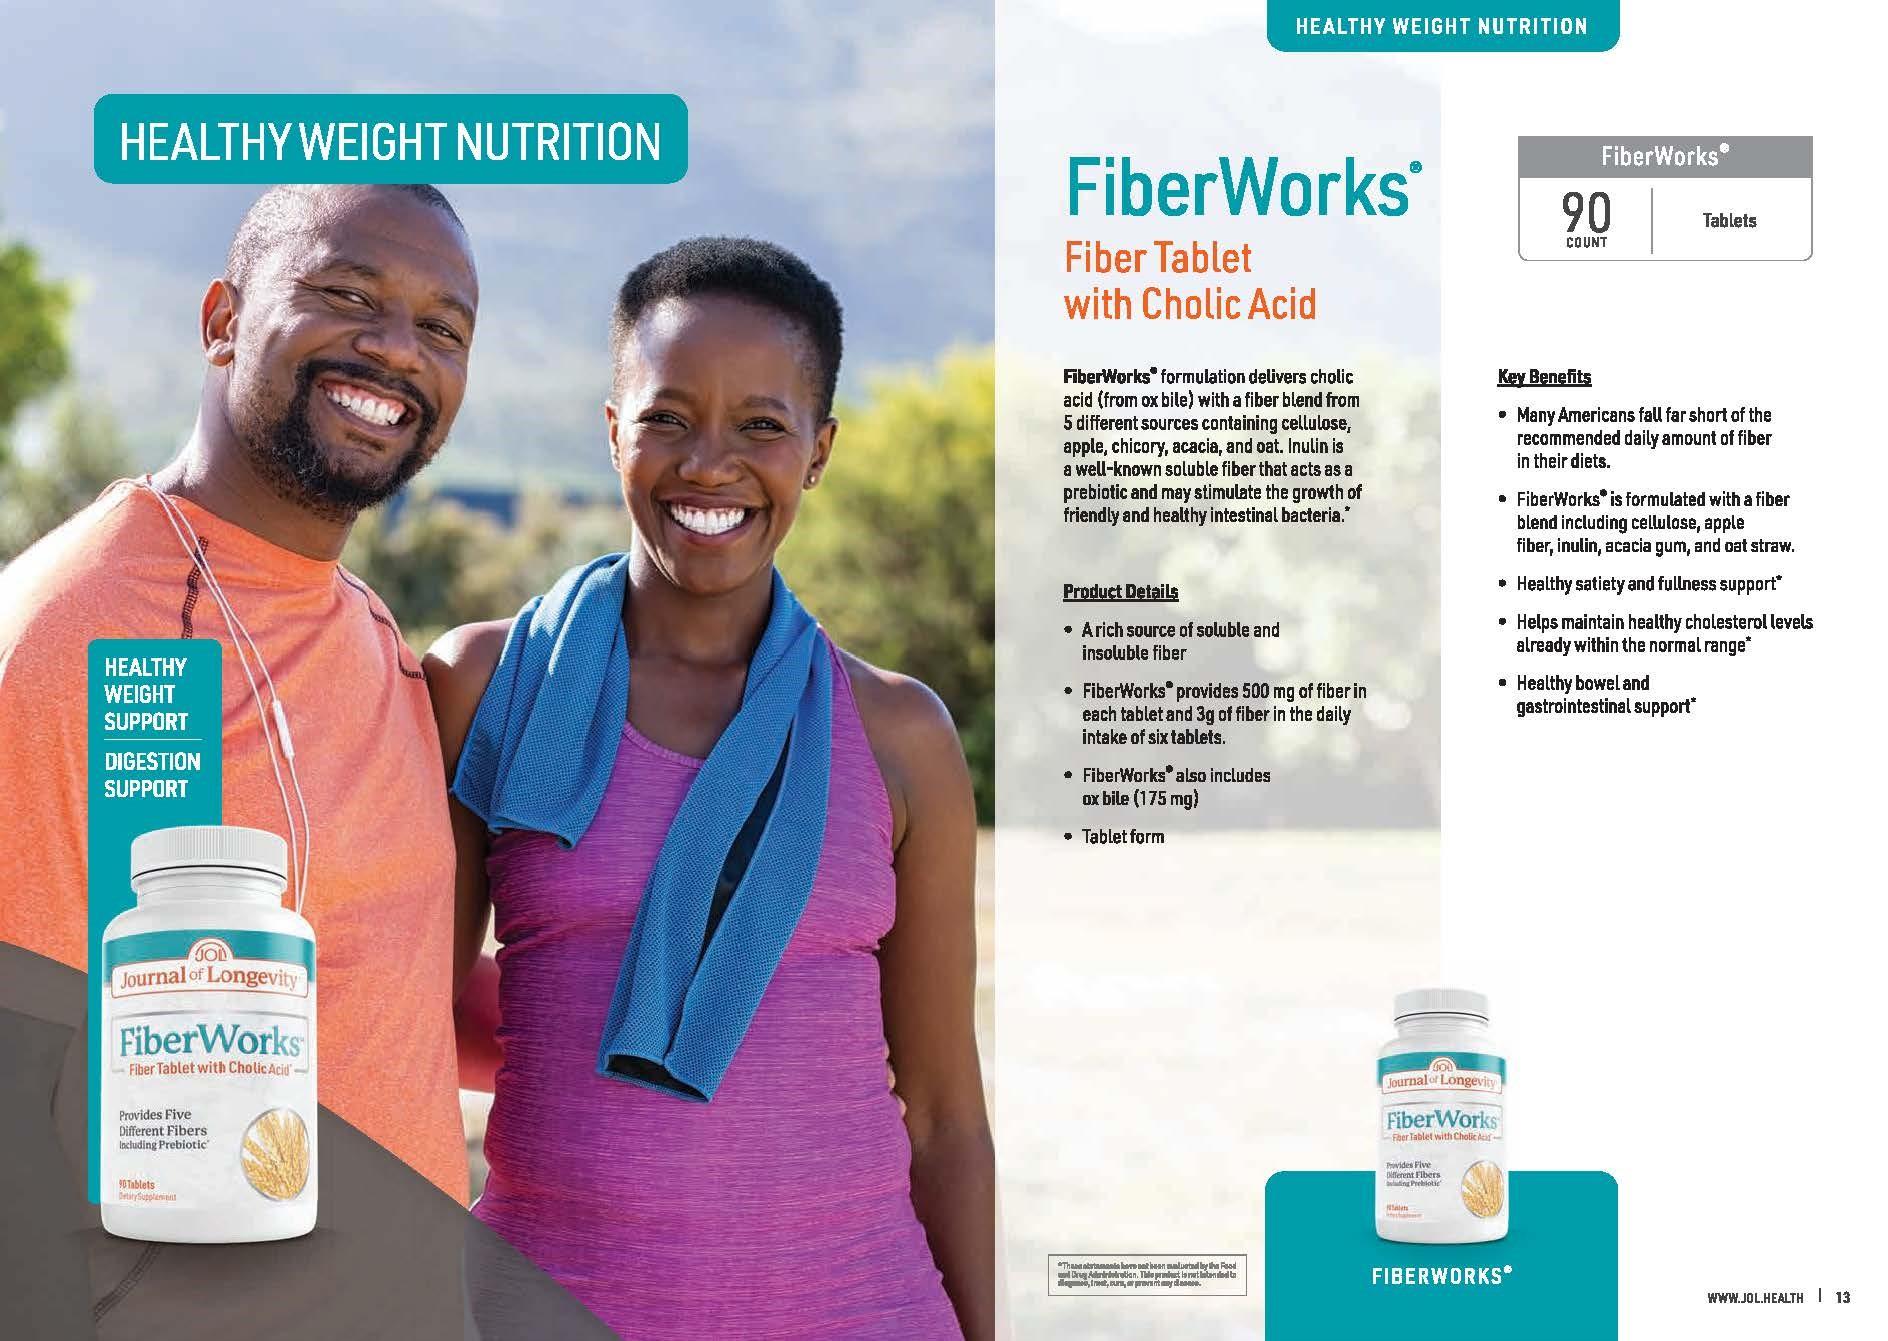 Journal of Longevity Fiber Works Tablet with Cholic Acid Supplement Nutrition